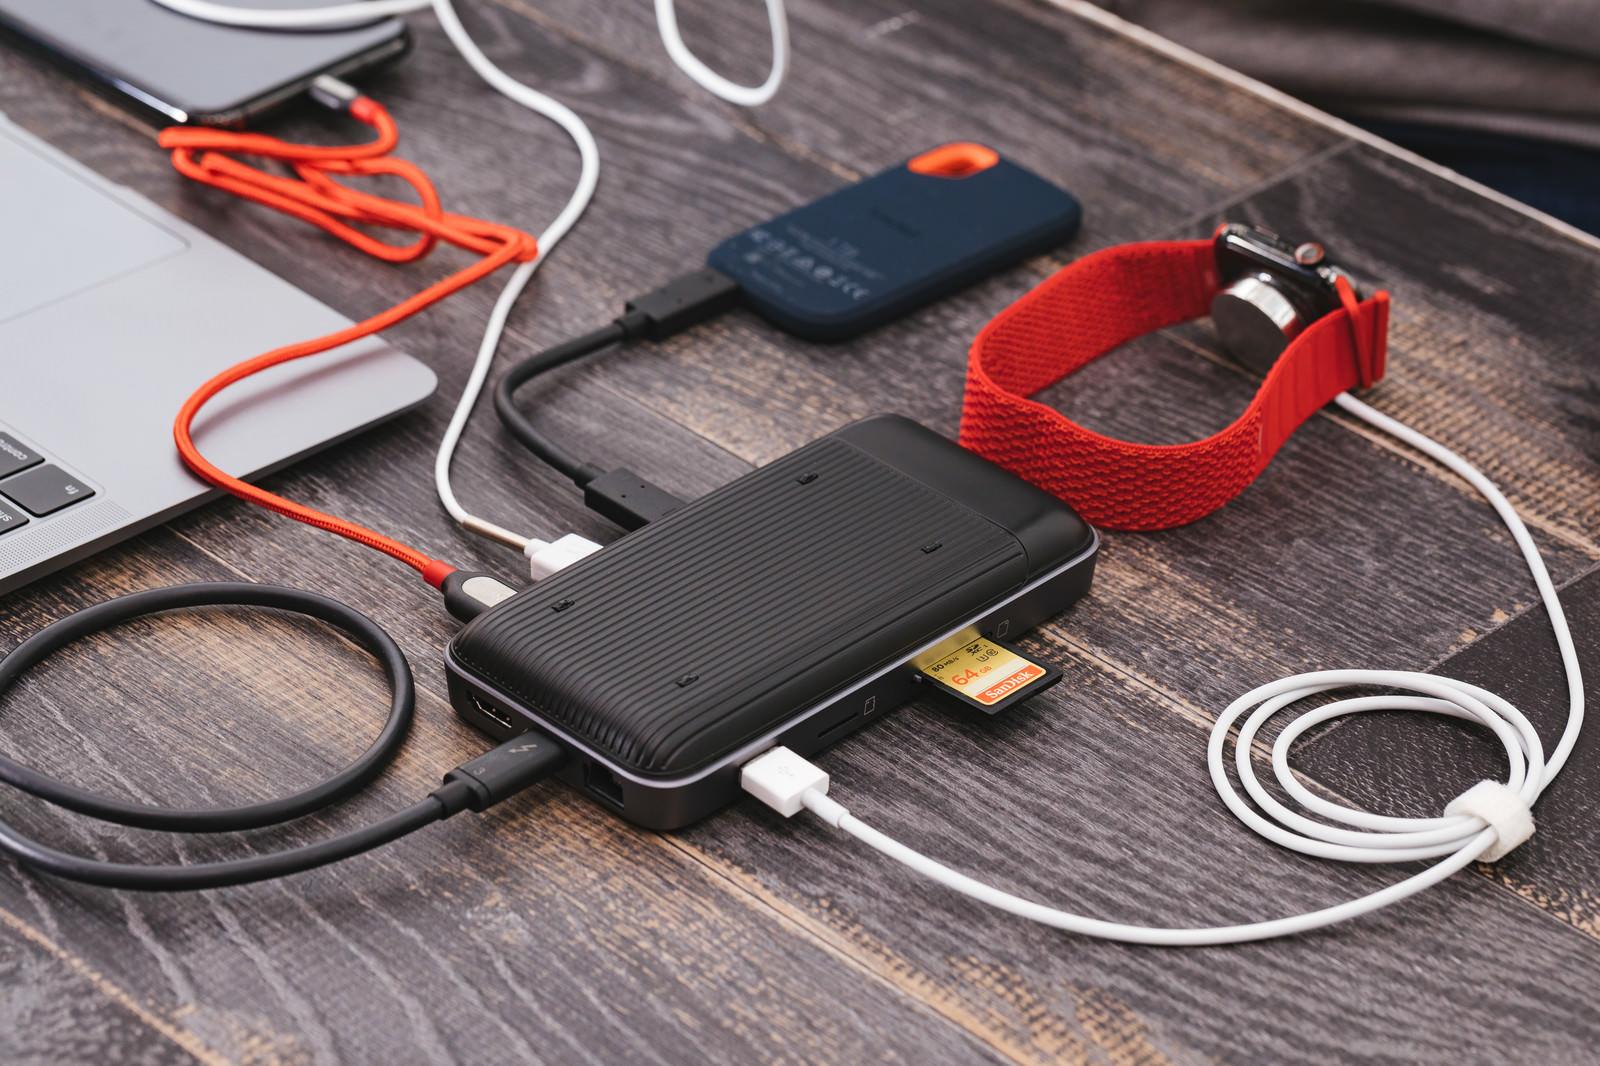 「SDカードを挿したり充電もできるUSB-Cハブ」の写真